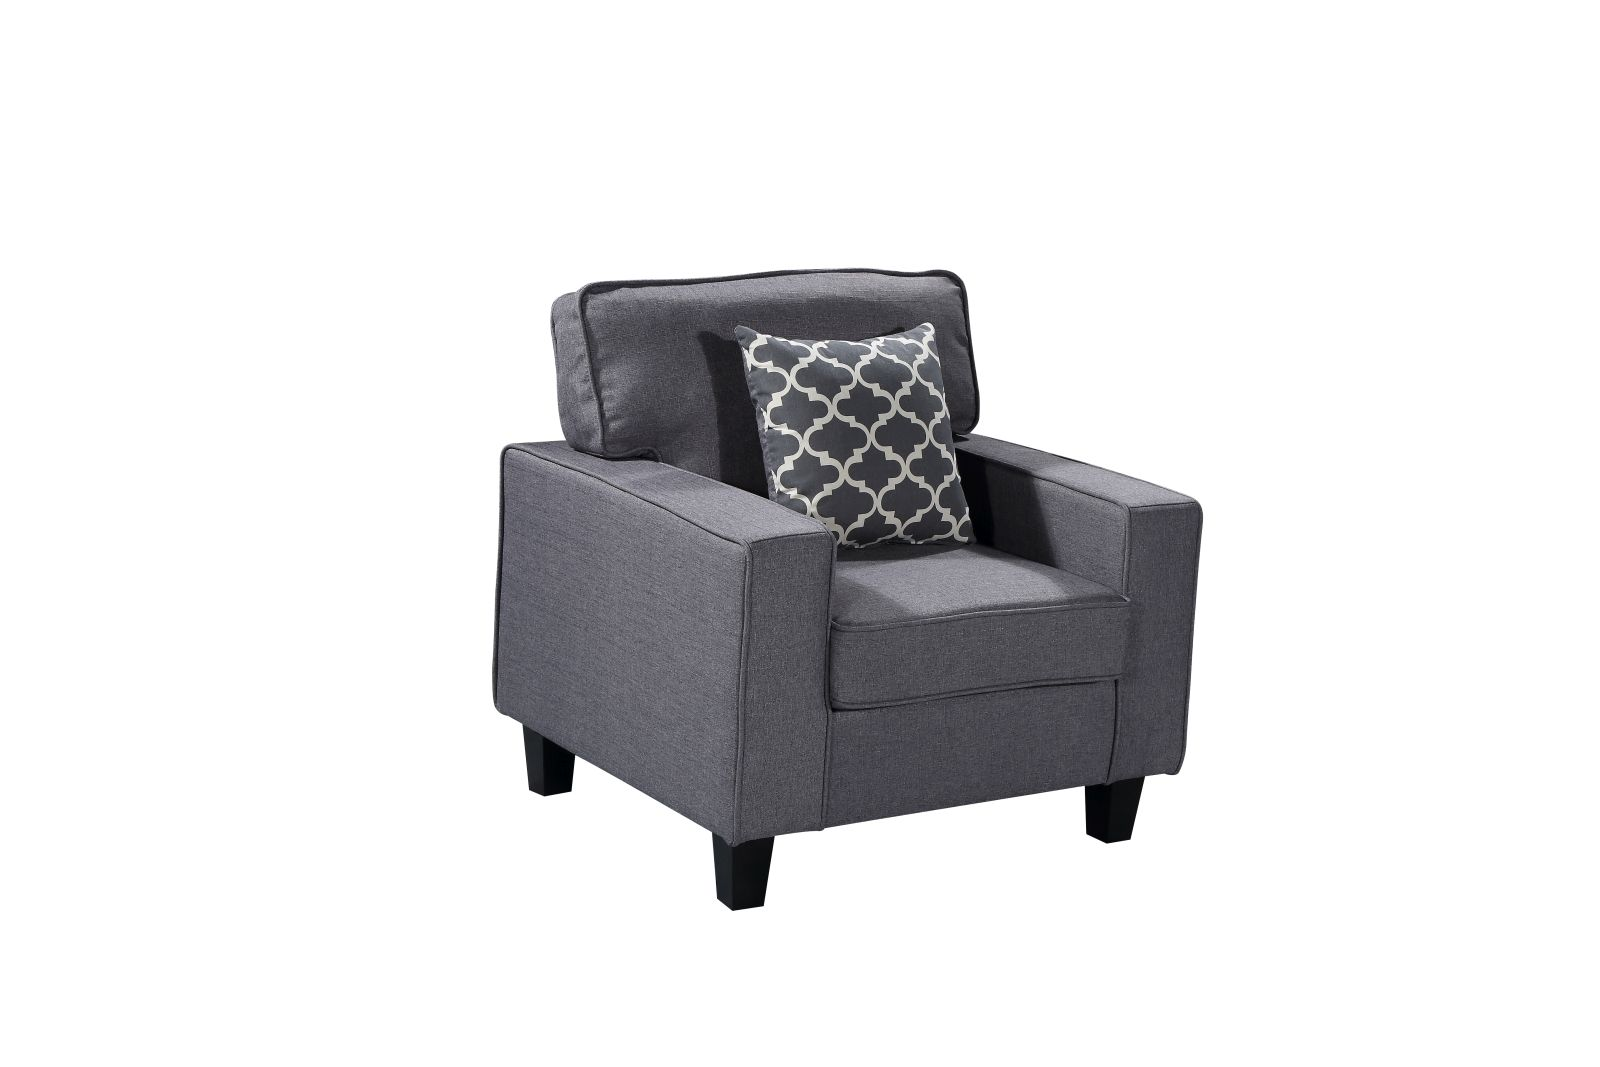 HS280 Husky Furniture Zara Chair Gray W